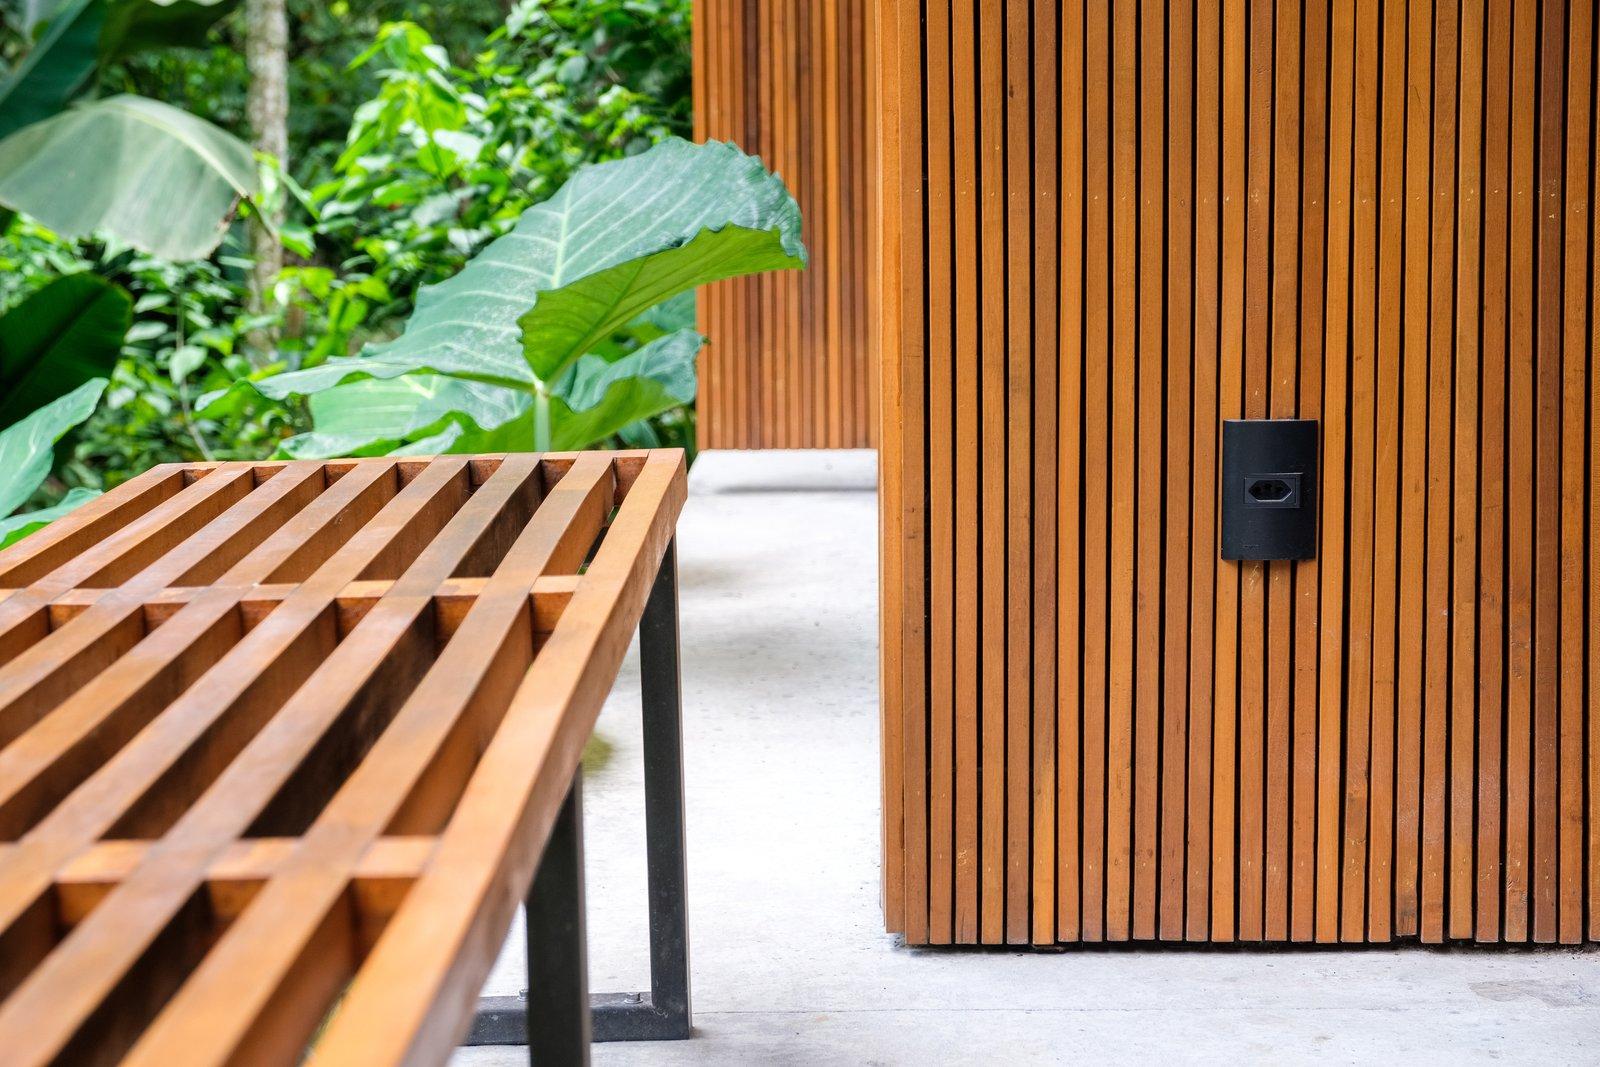 Un detalle de la pantalla de madera de la casa bioclimática.